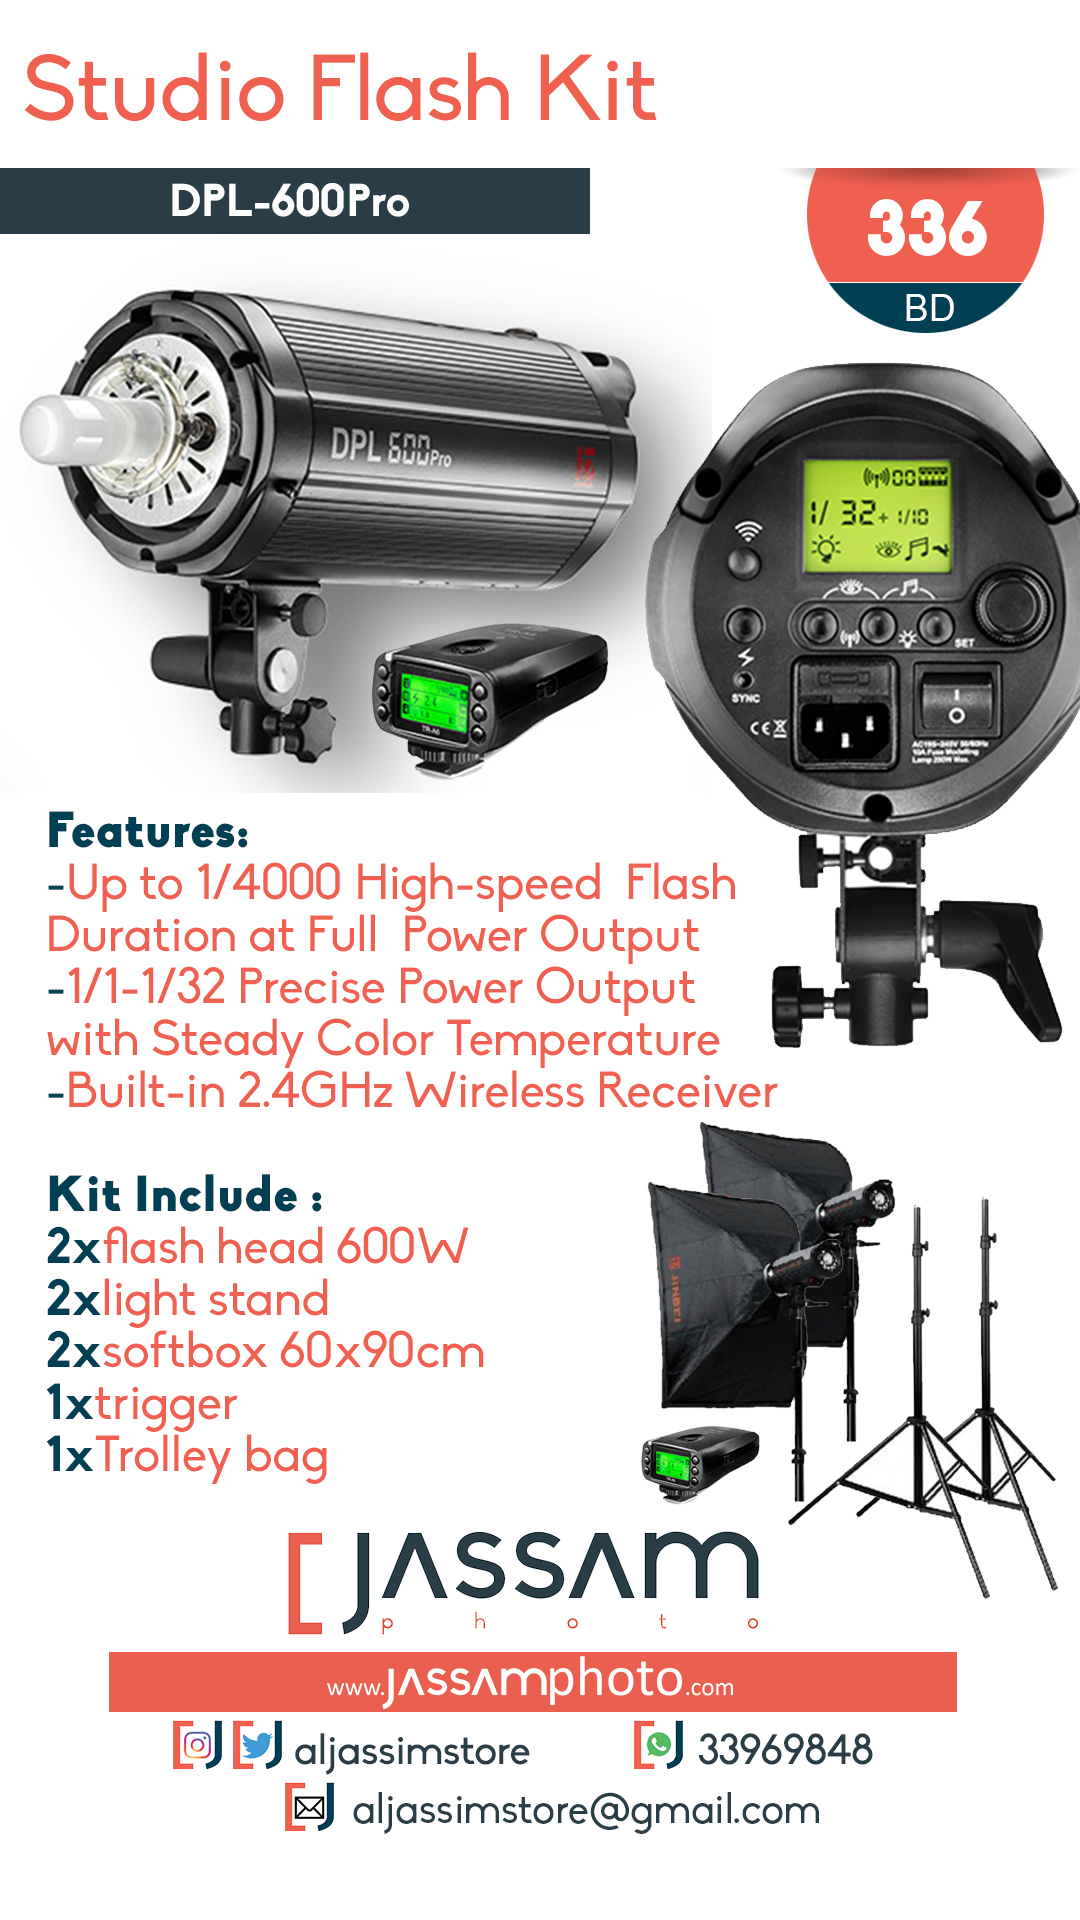 Studio Flash Kit DPL-600 Pro